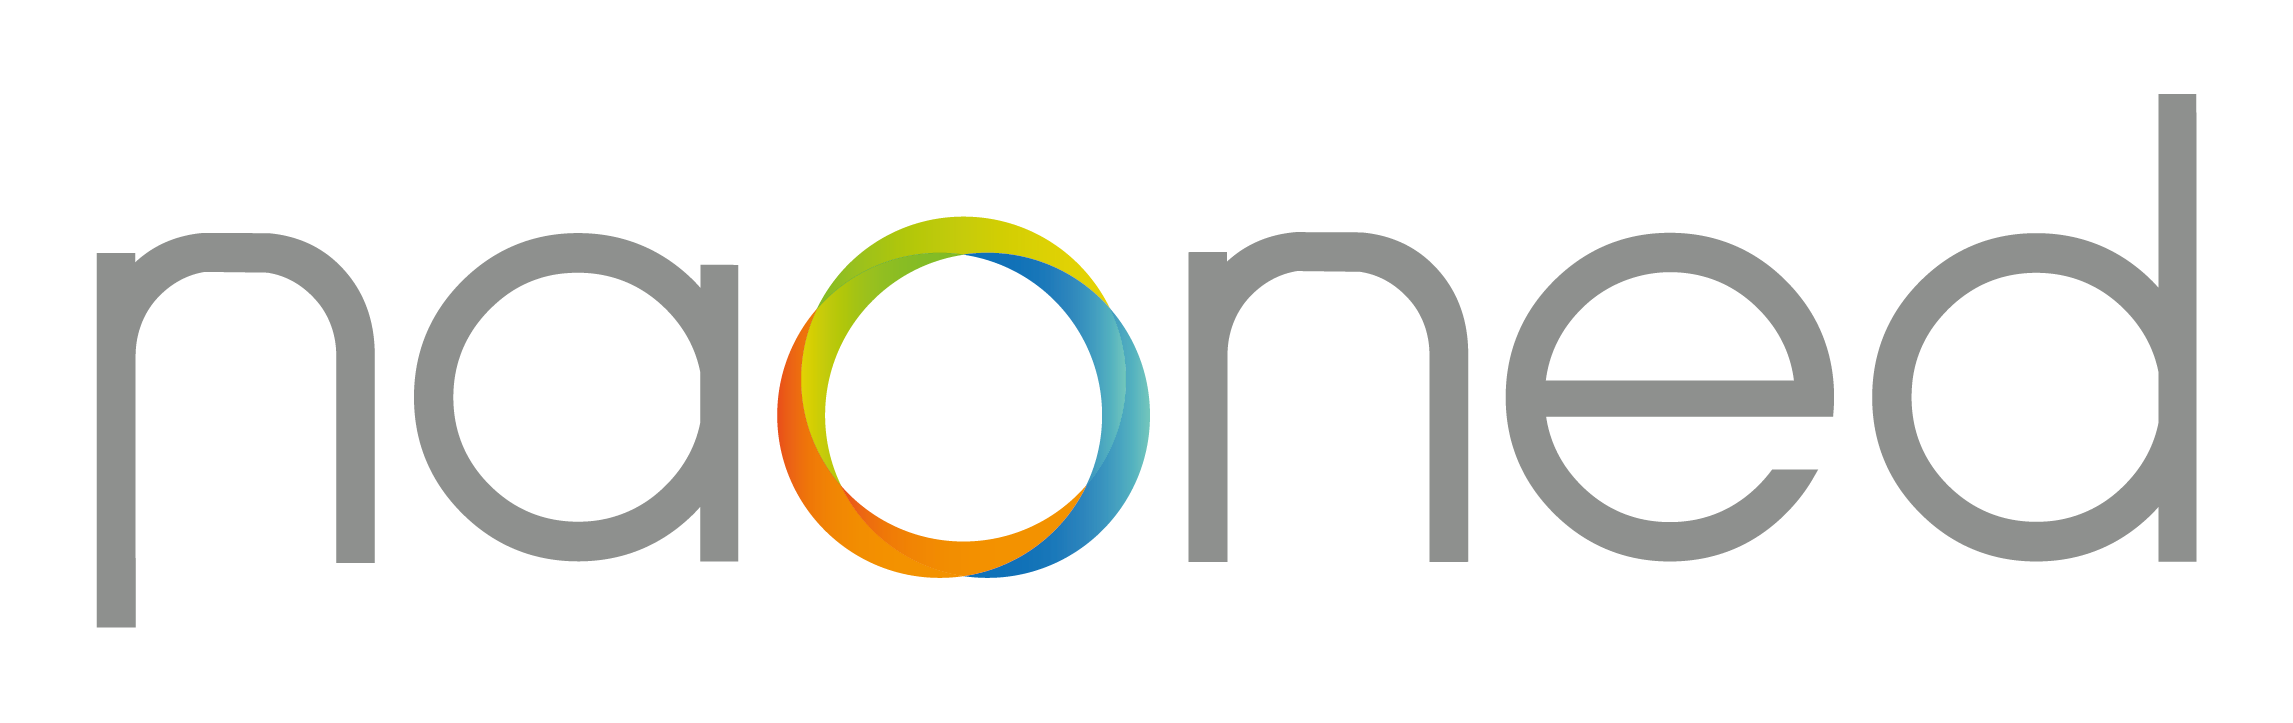 Logotype 4x